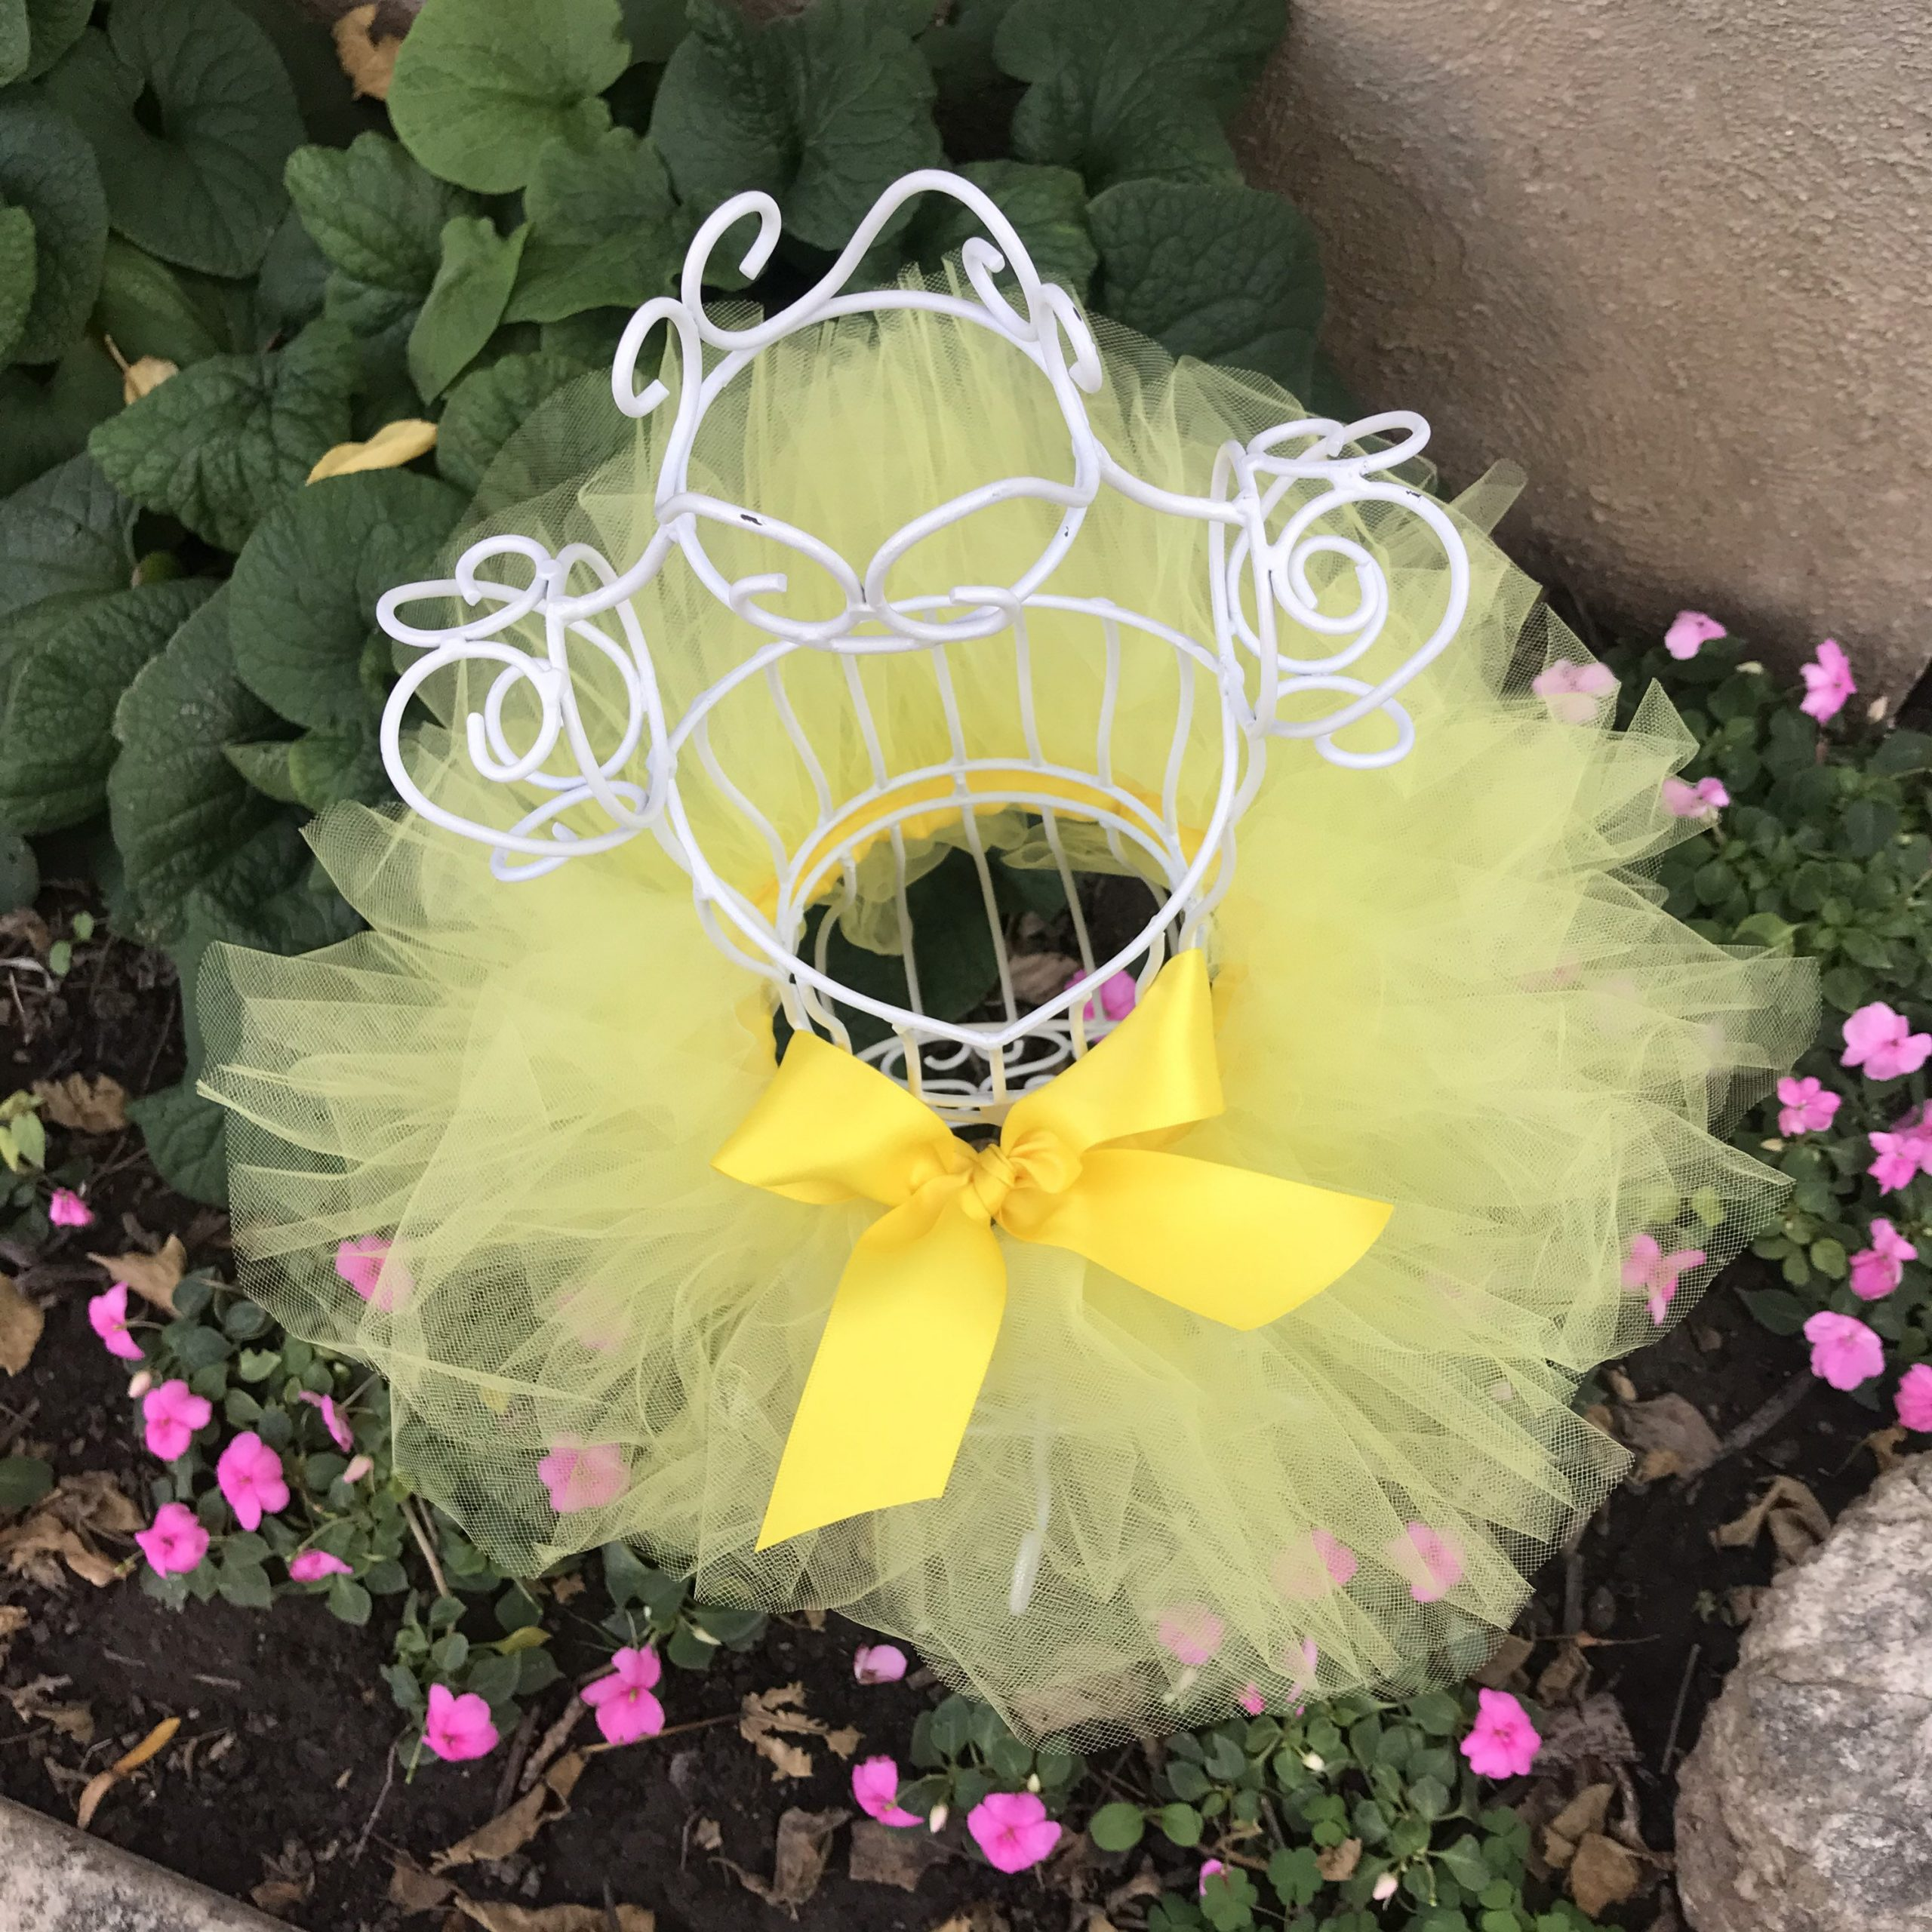 Yellow Tutu Dress Up Ballerina Outfit Toddler Girls Pixie Tinkerbell Halloween Costume First Birthday Cake Smash Photo Prop Baby Shower Gift